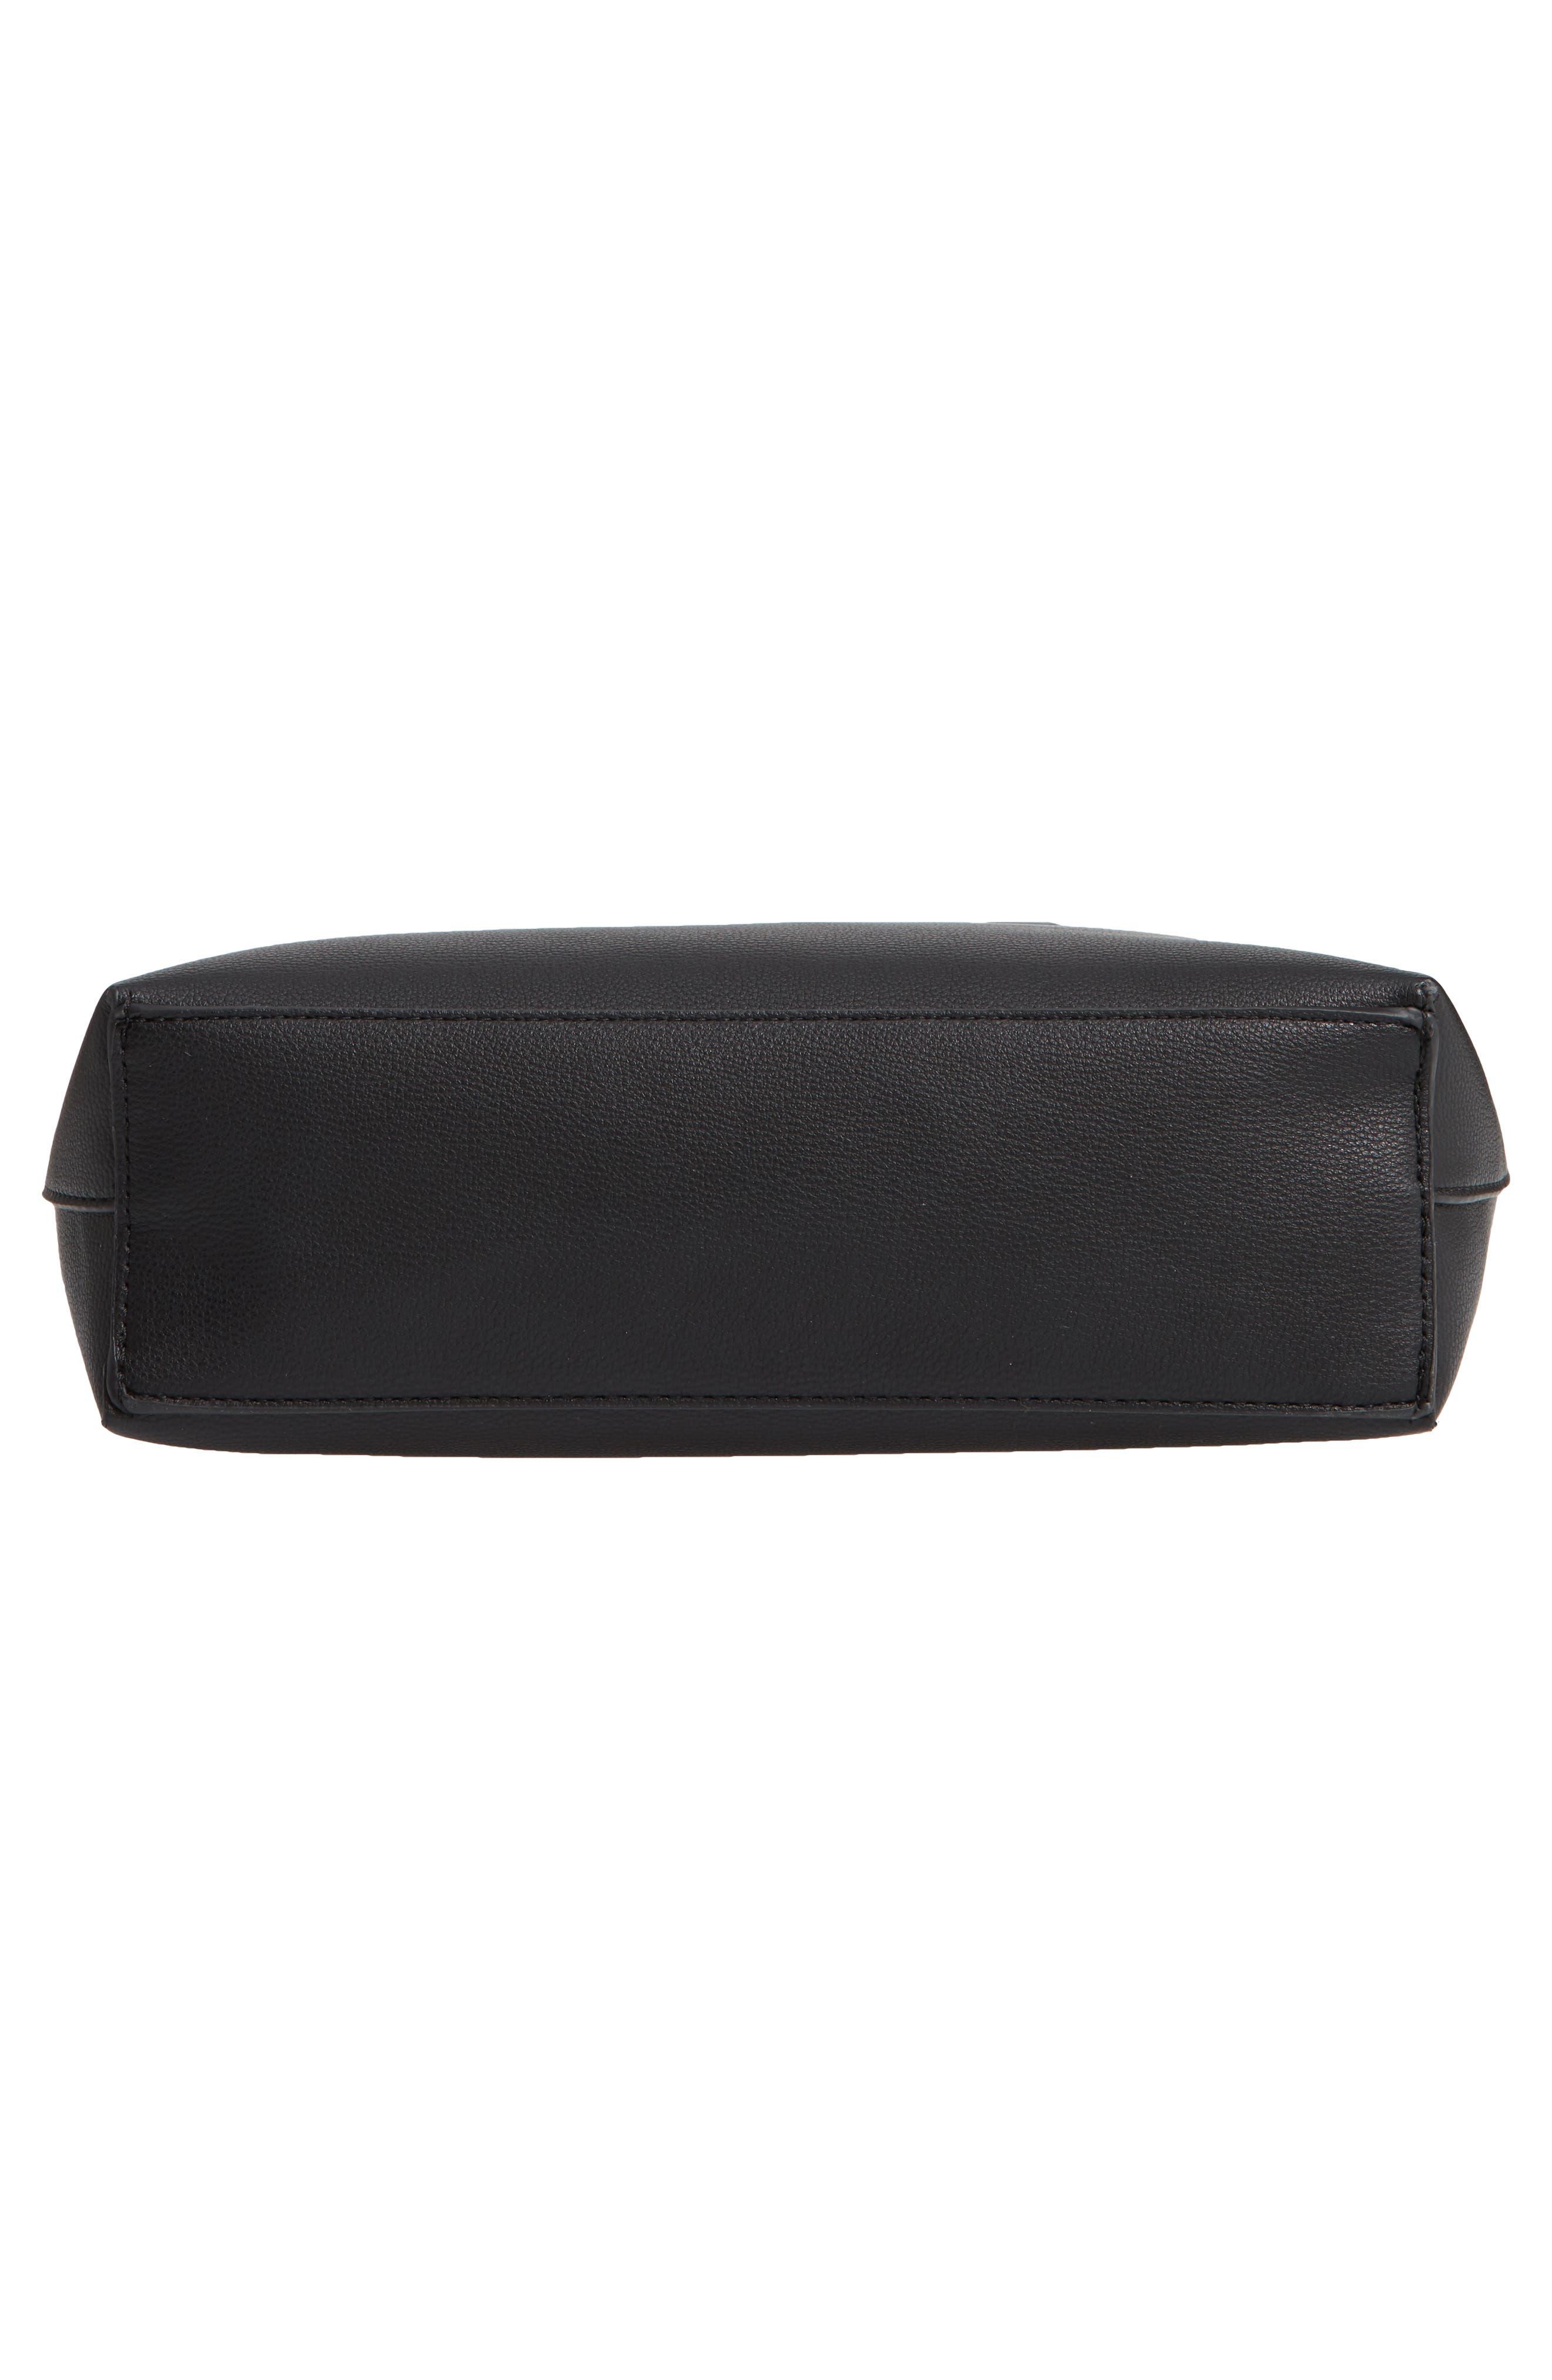 Payton Convertible Faux Leather Tote,                             Alternate thumbnail 6, color,                             BLACK